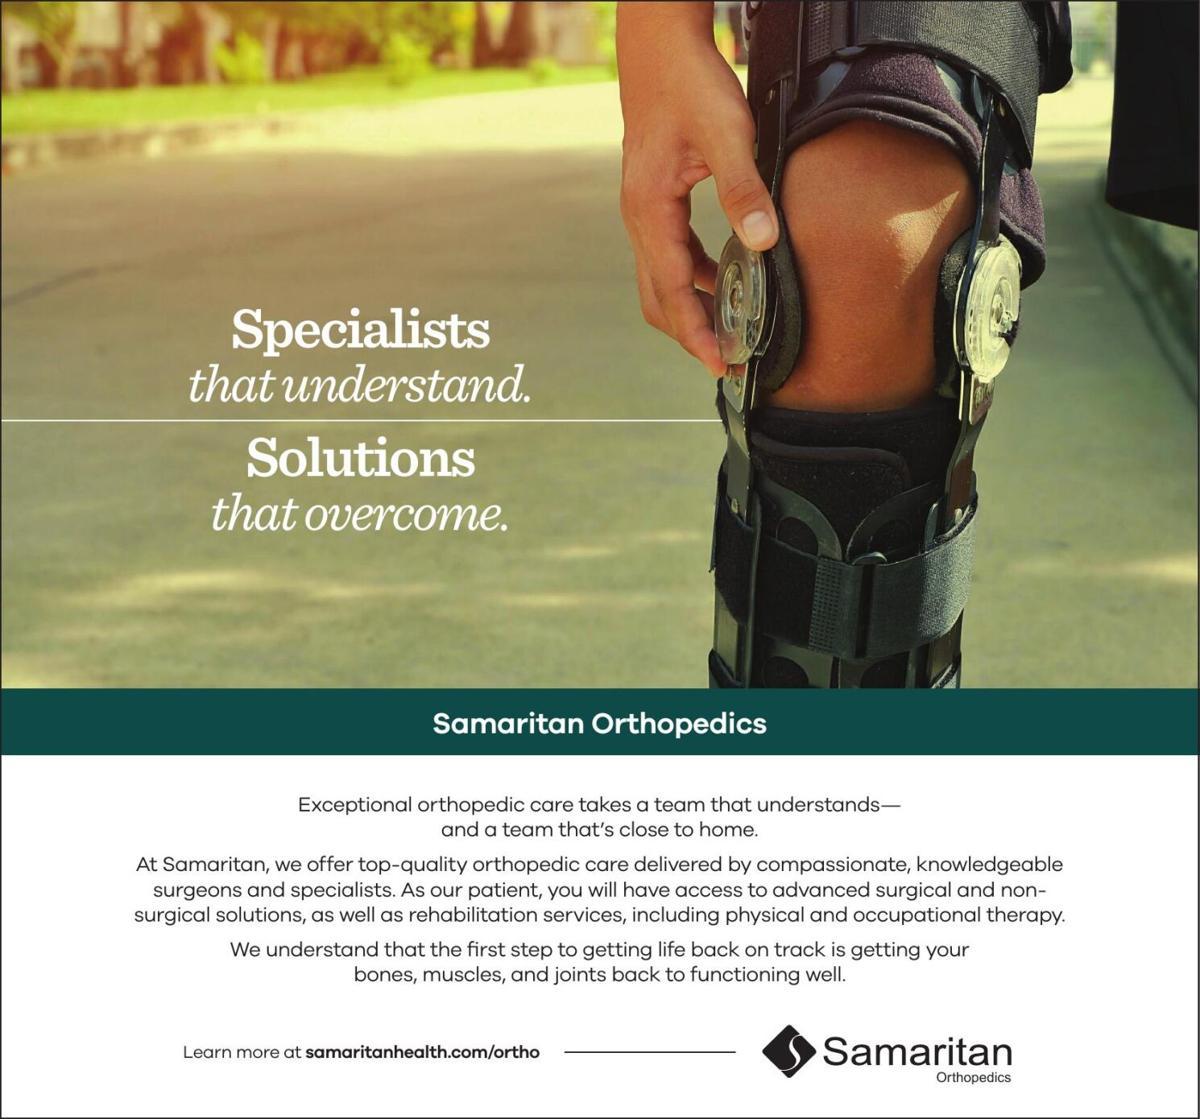 Samaritan Orthopedics